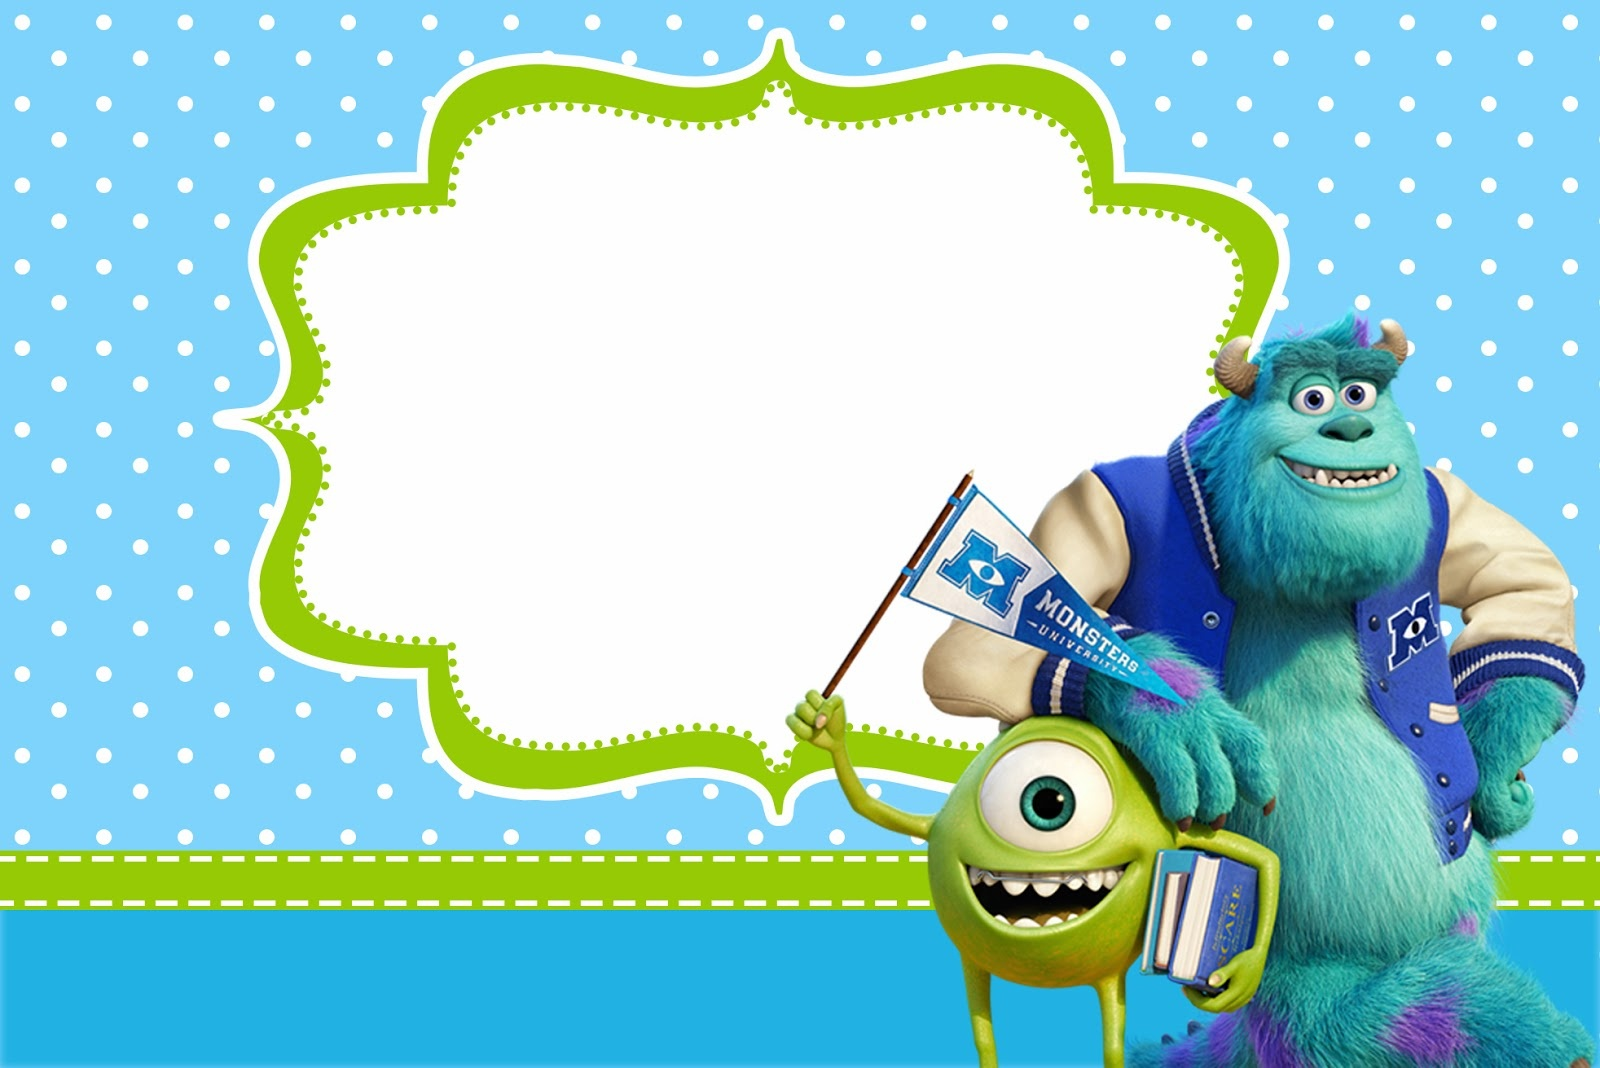 Monster University: Free Printable Party Invitations. - Oh My Fiesta - Free Printable Monsters Inc Birthday Invitations